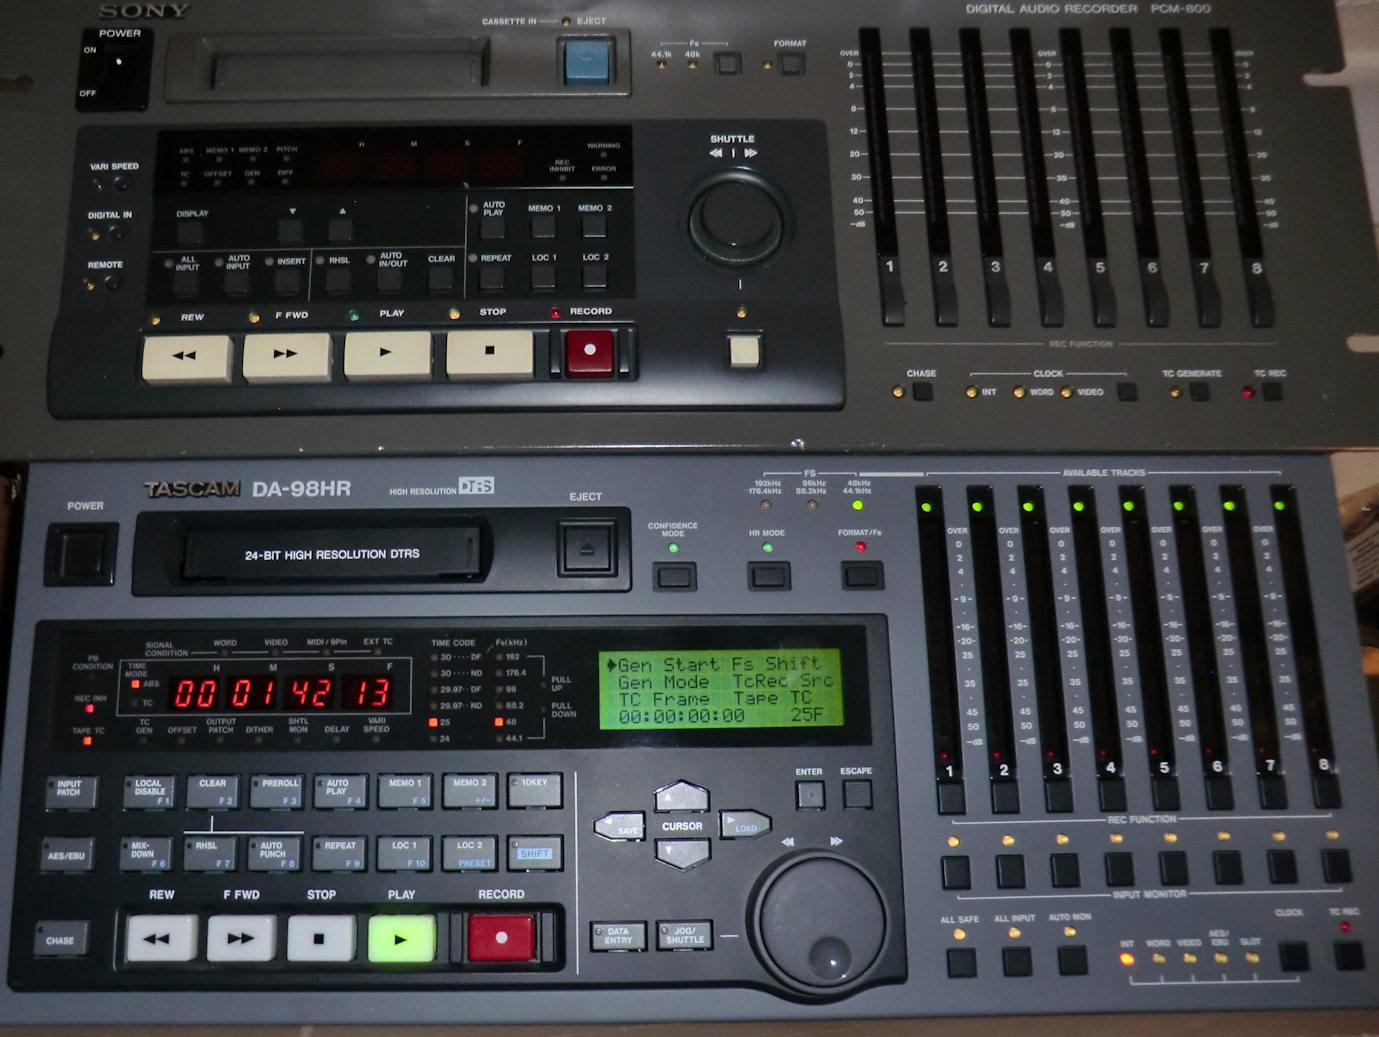 8 track digital recordings on Hi8.